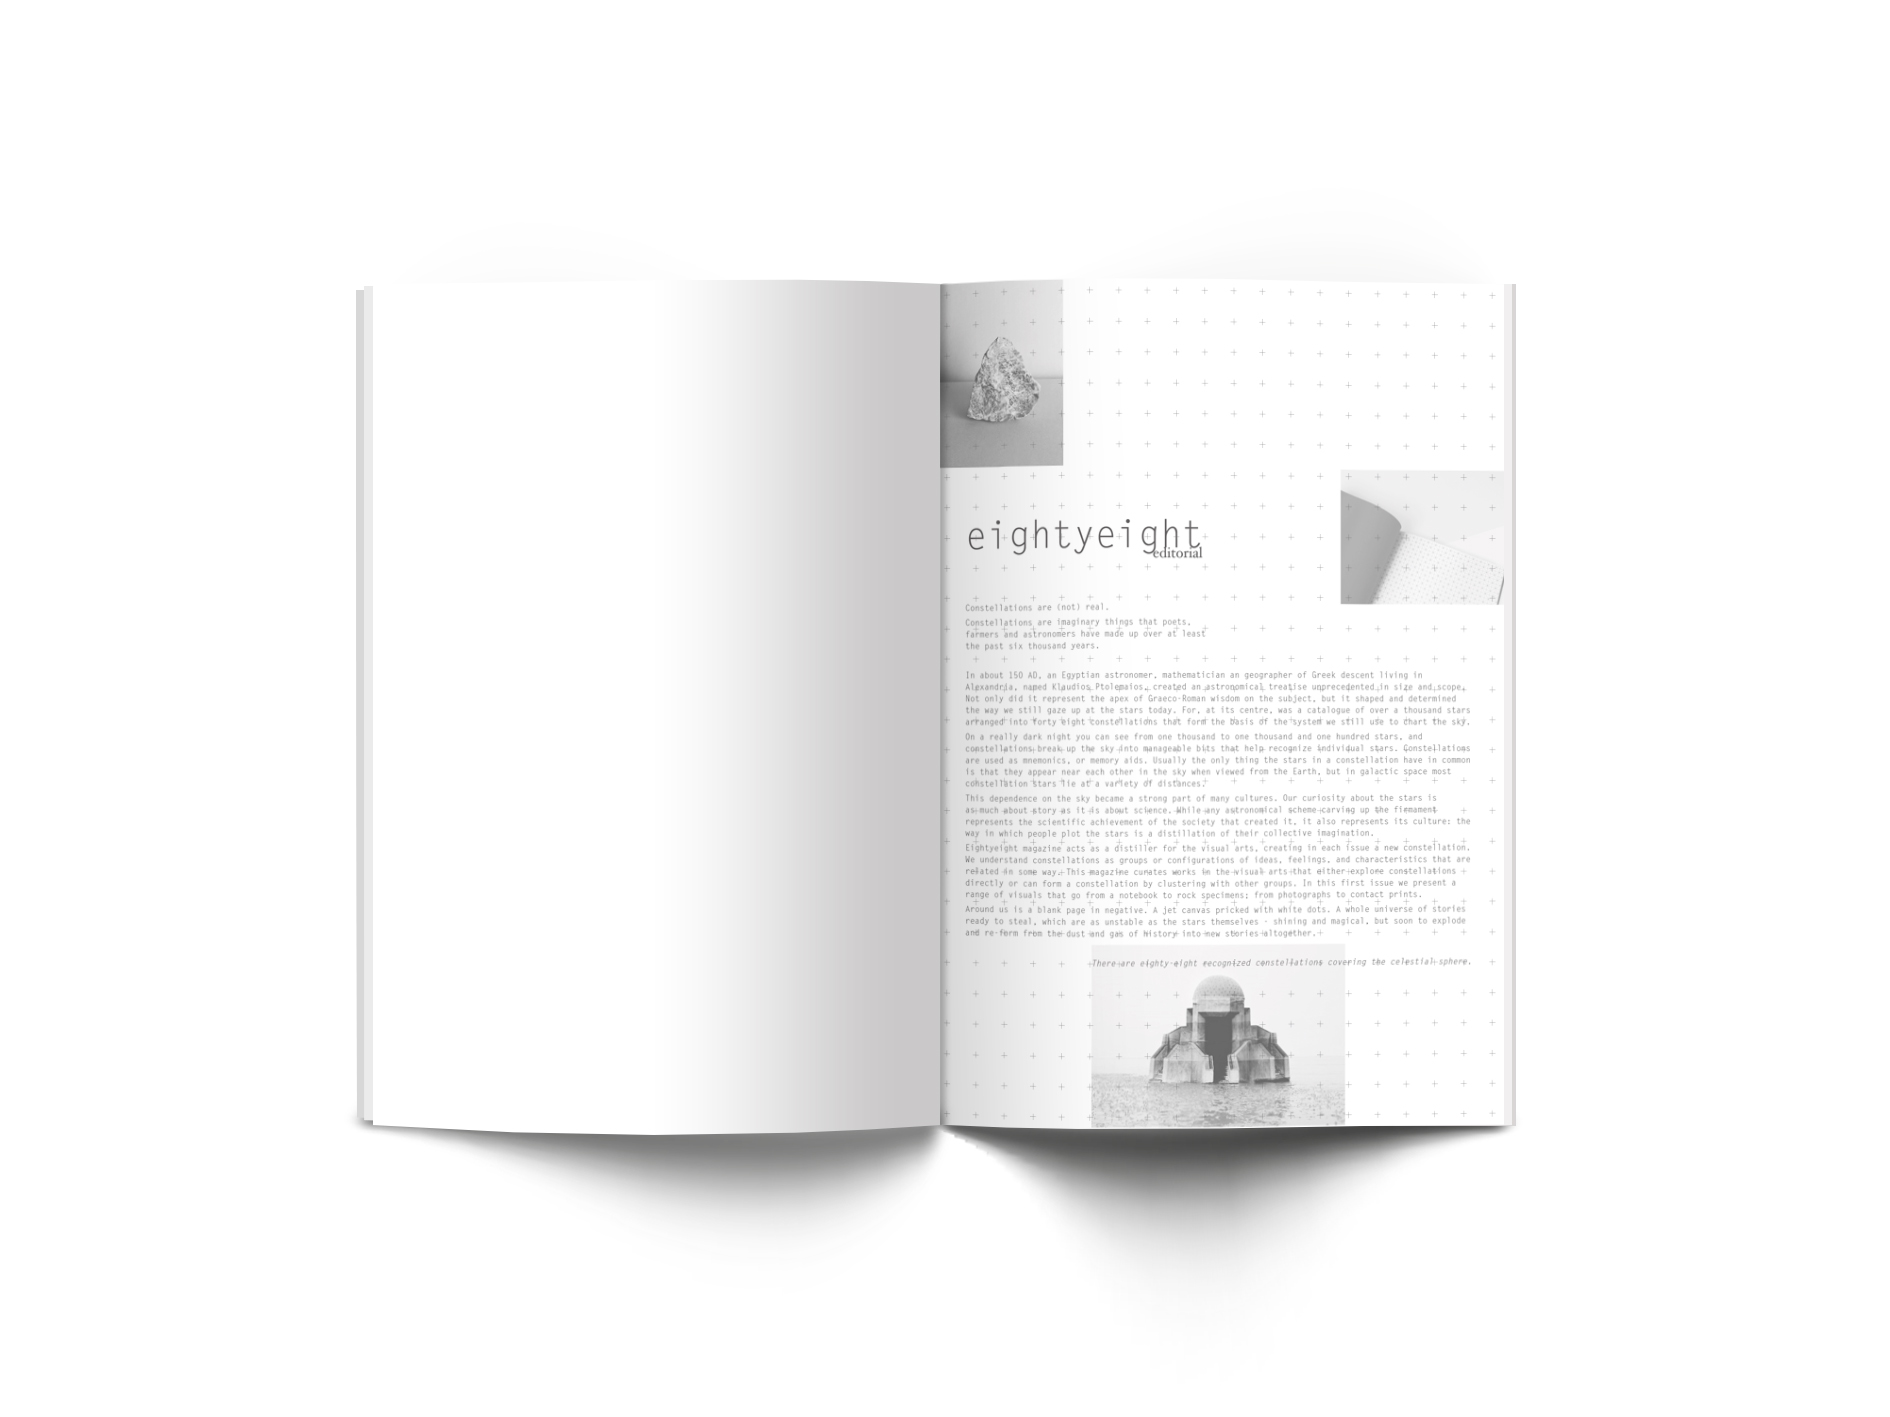 88 ed1.jpg